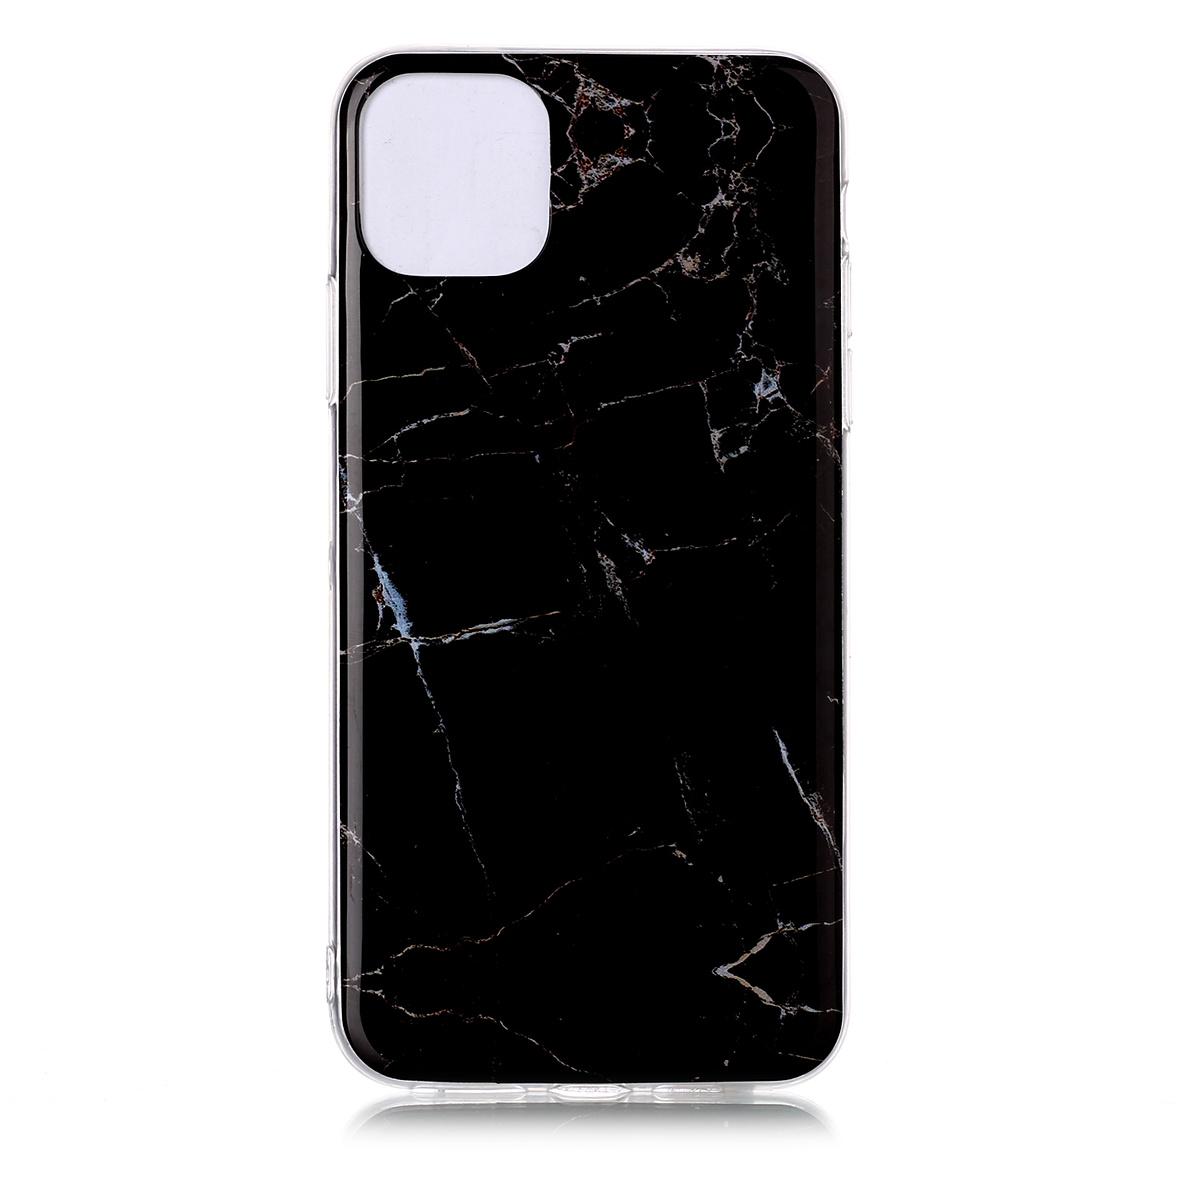 Trendigt marmorskal med mönster, iPhone 11 Pro Max, svart